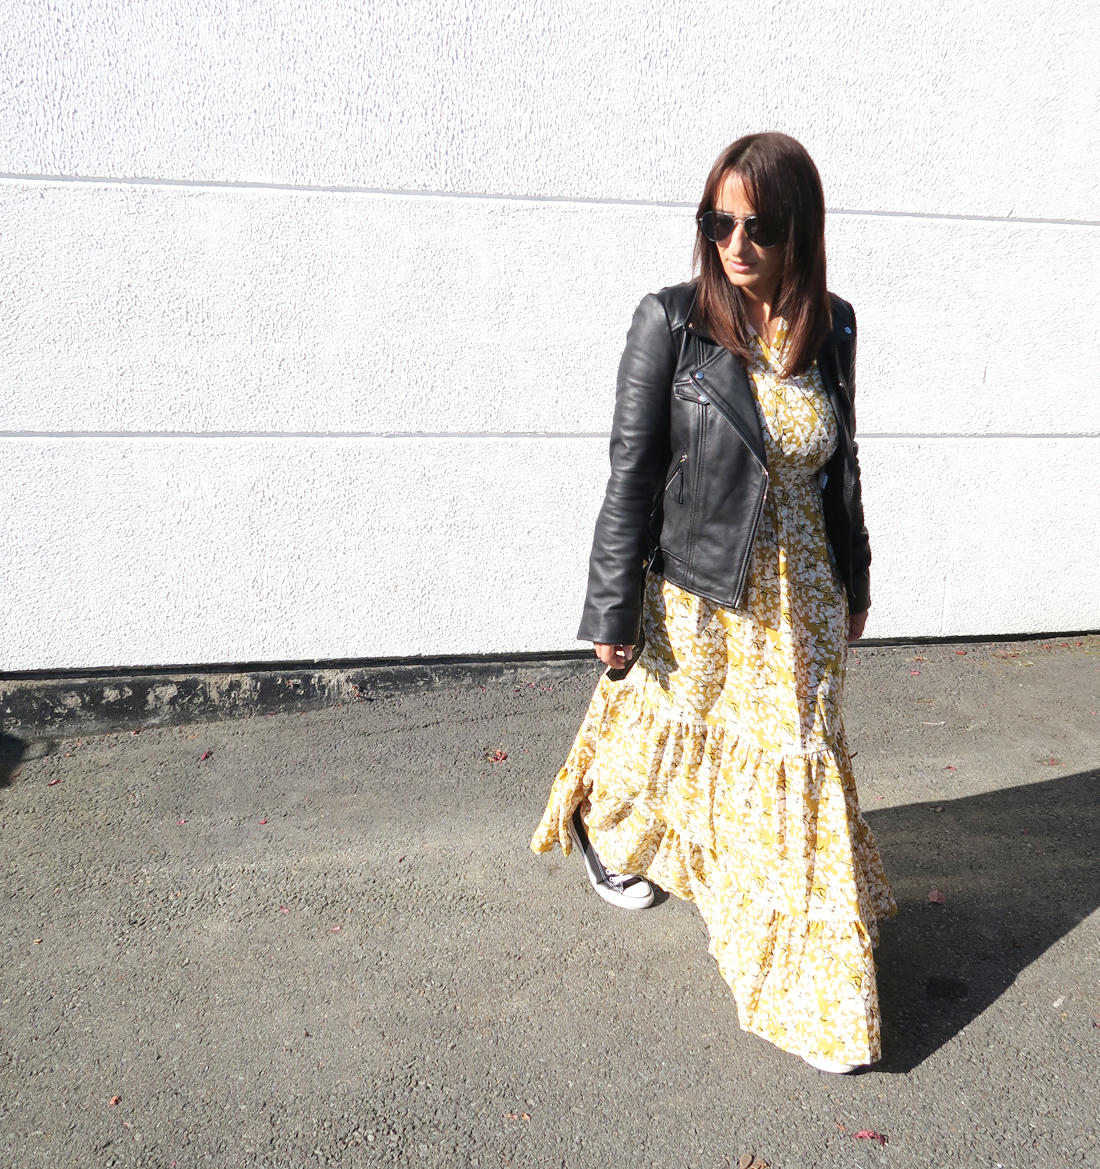 dressfo-kleid-modeblogger-fashionblogger-blogger-style-fashion-modesalat-streetstyle-5